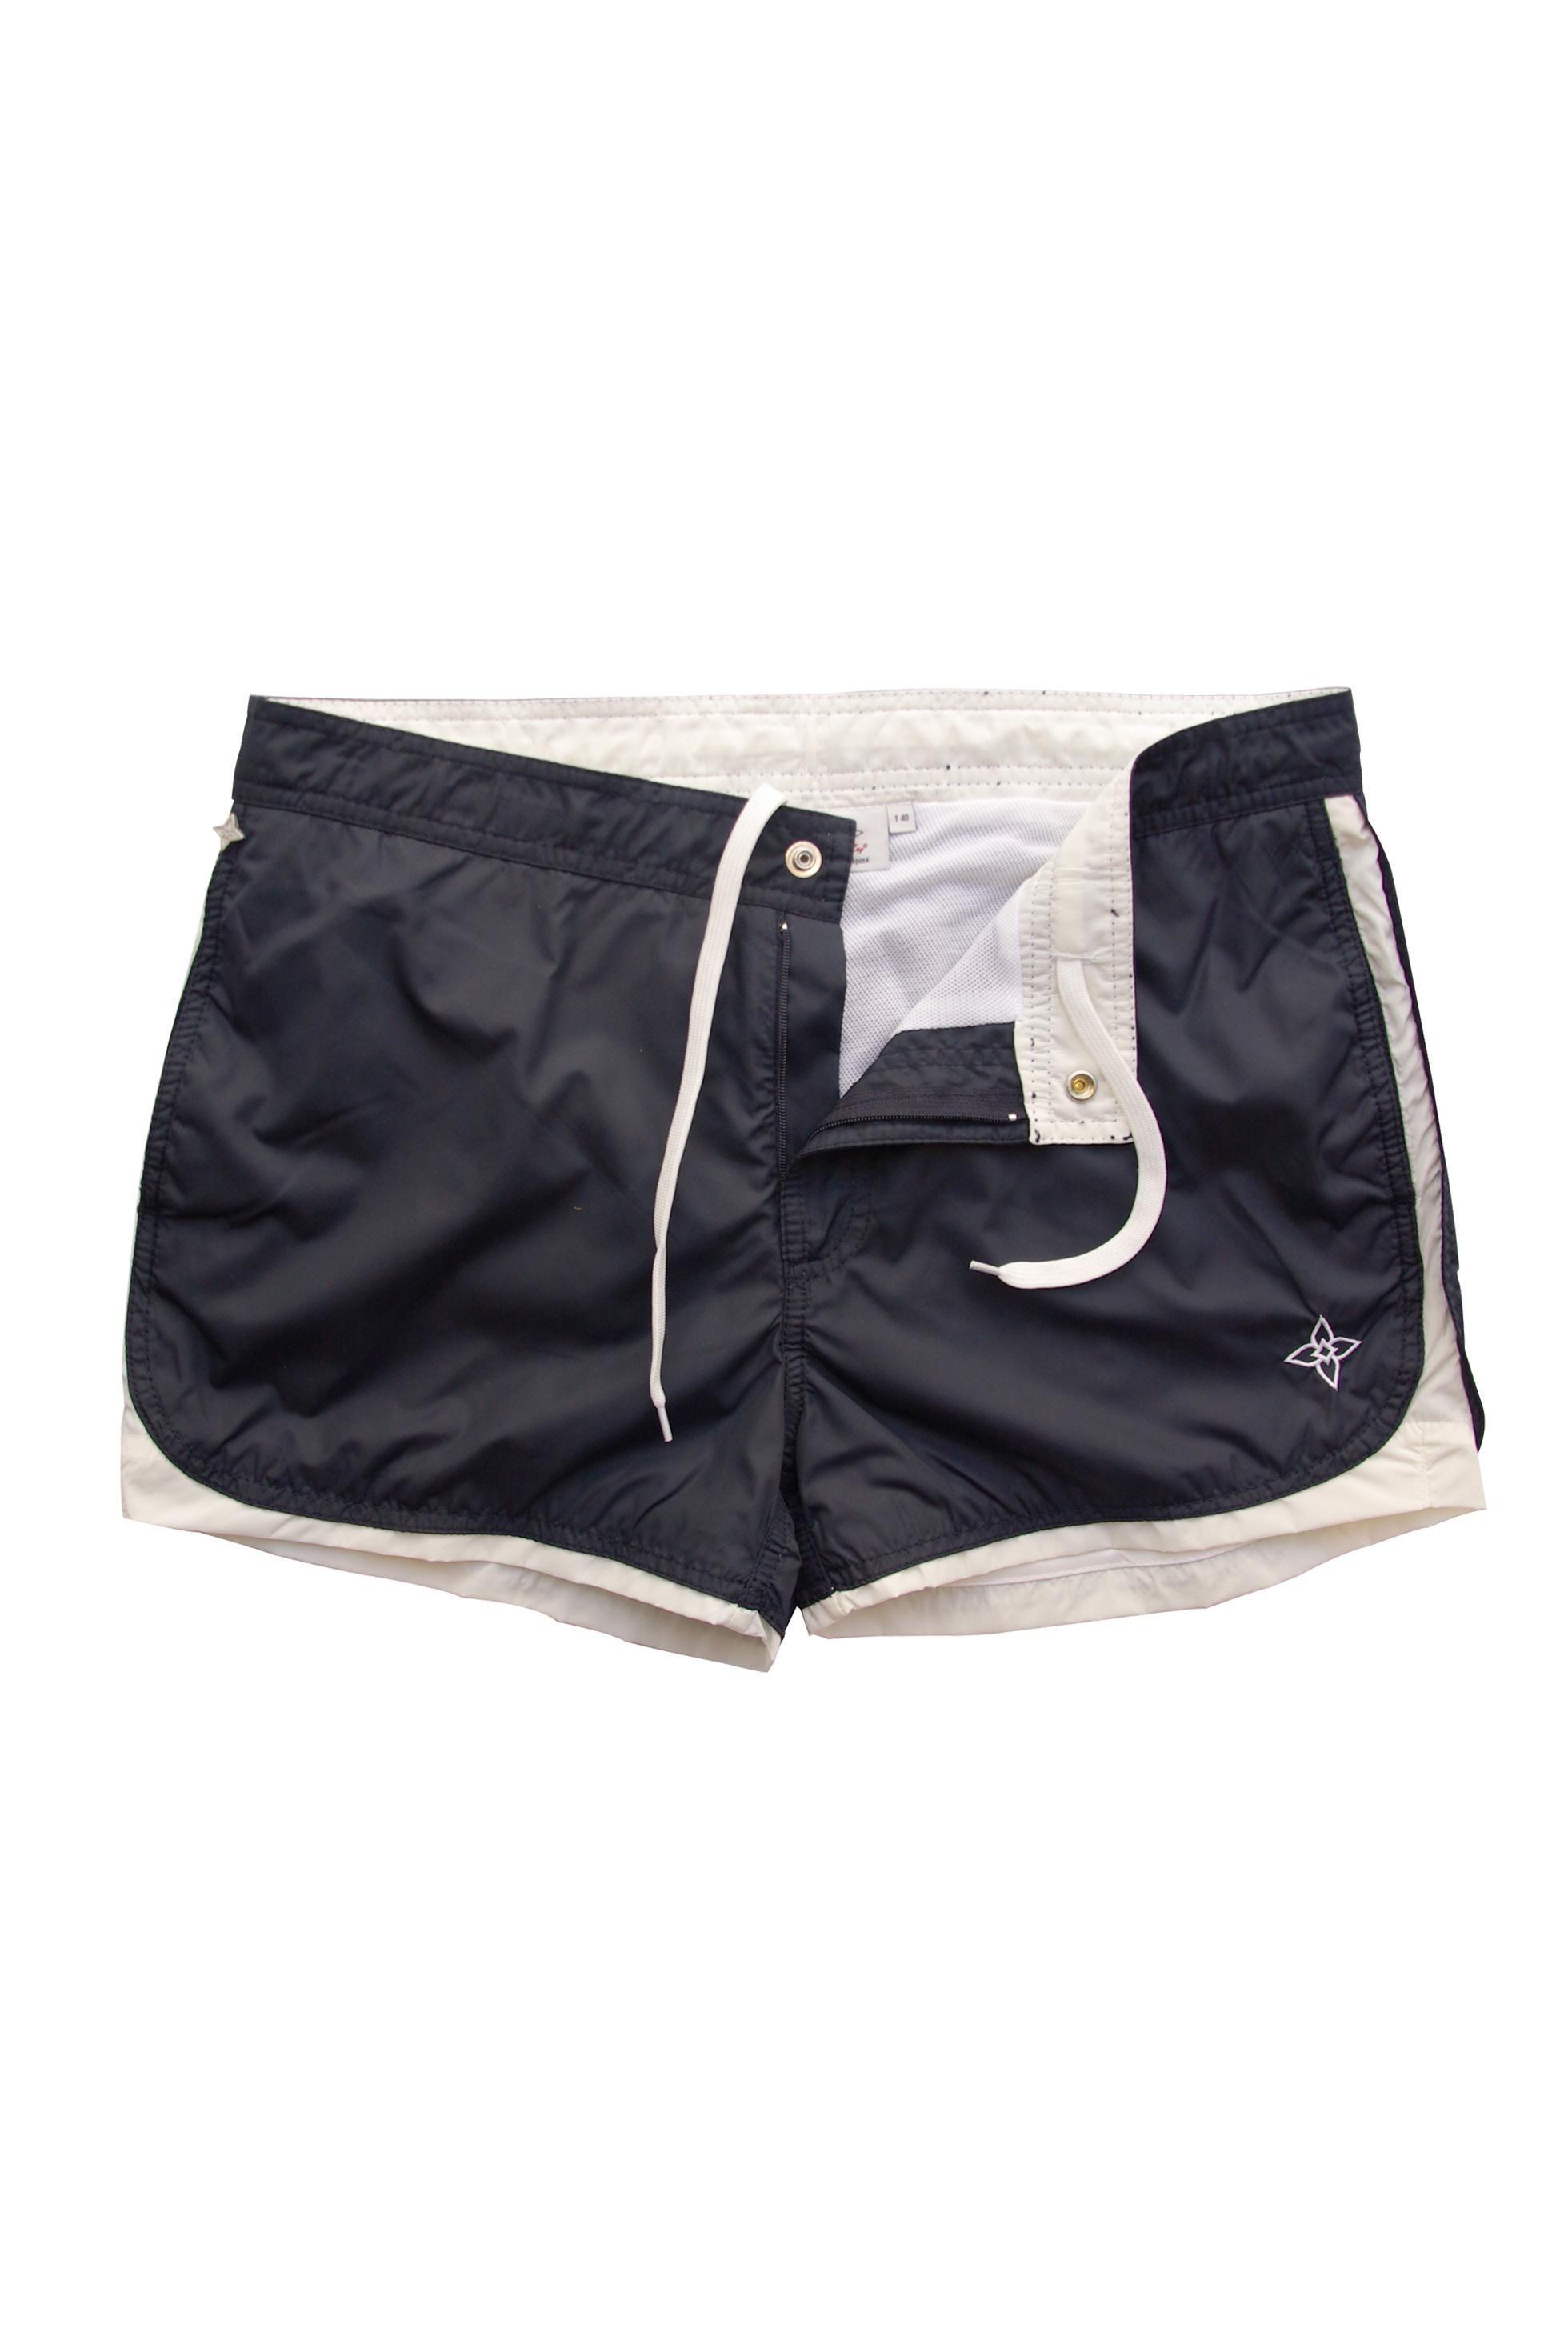 Men/'s Summer Swim Trunks Shorts Boxers Slips Maillots de Bain Maillot De Bain Baignade Pantalon